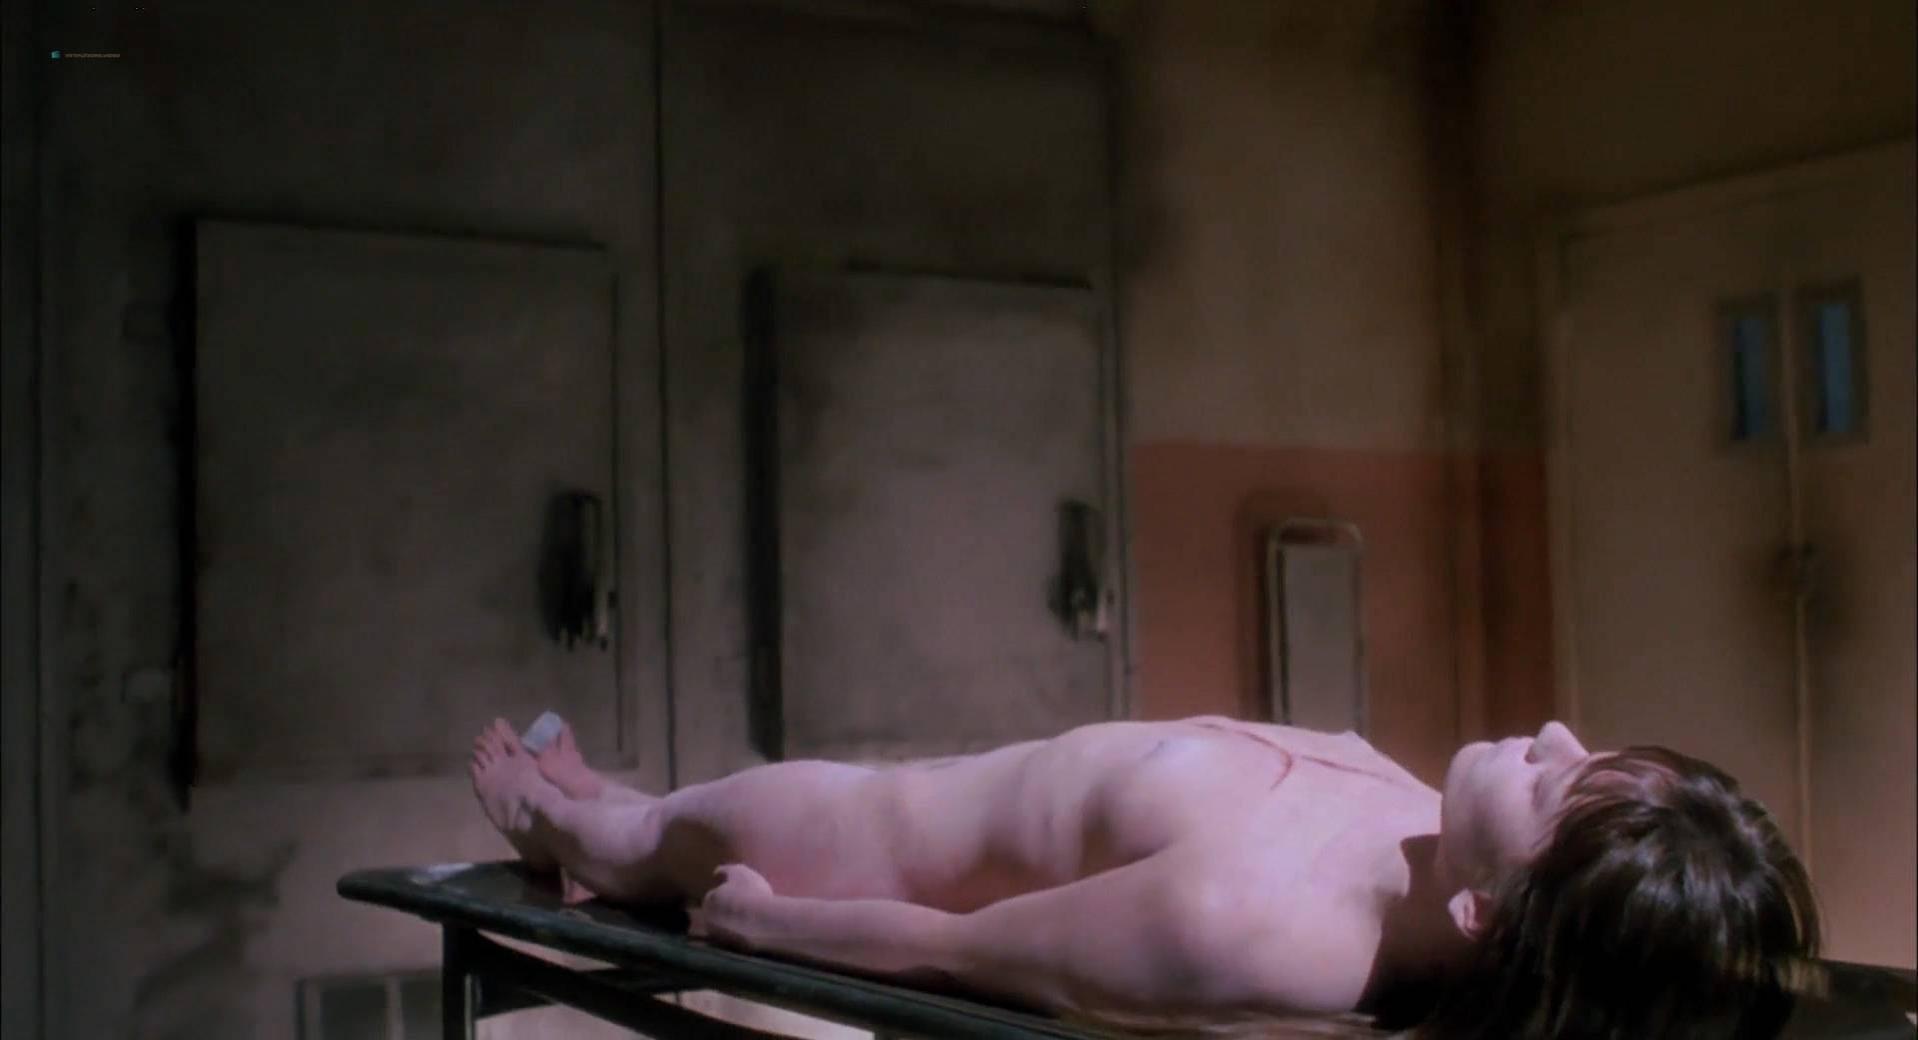 Samantha Phillips nude - Phantasm 2 (1988)